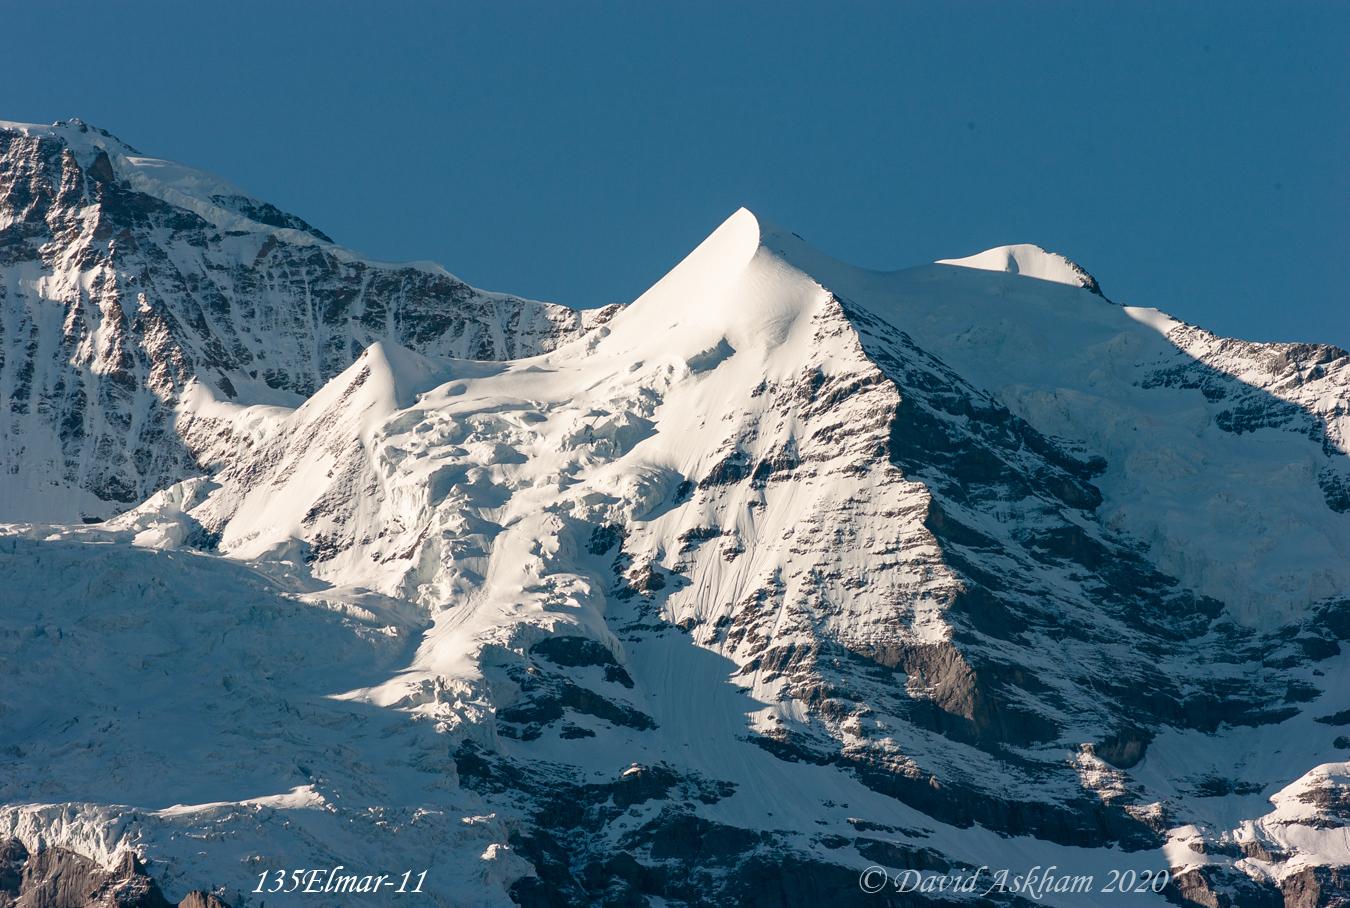 Alpine landscape with Silberhorn viewed from Wengen Switzerland (Leica M8 with 135mm Elmar lens (From same hotel balcony)